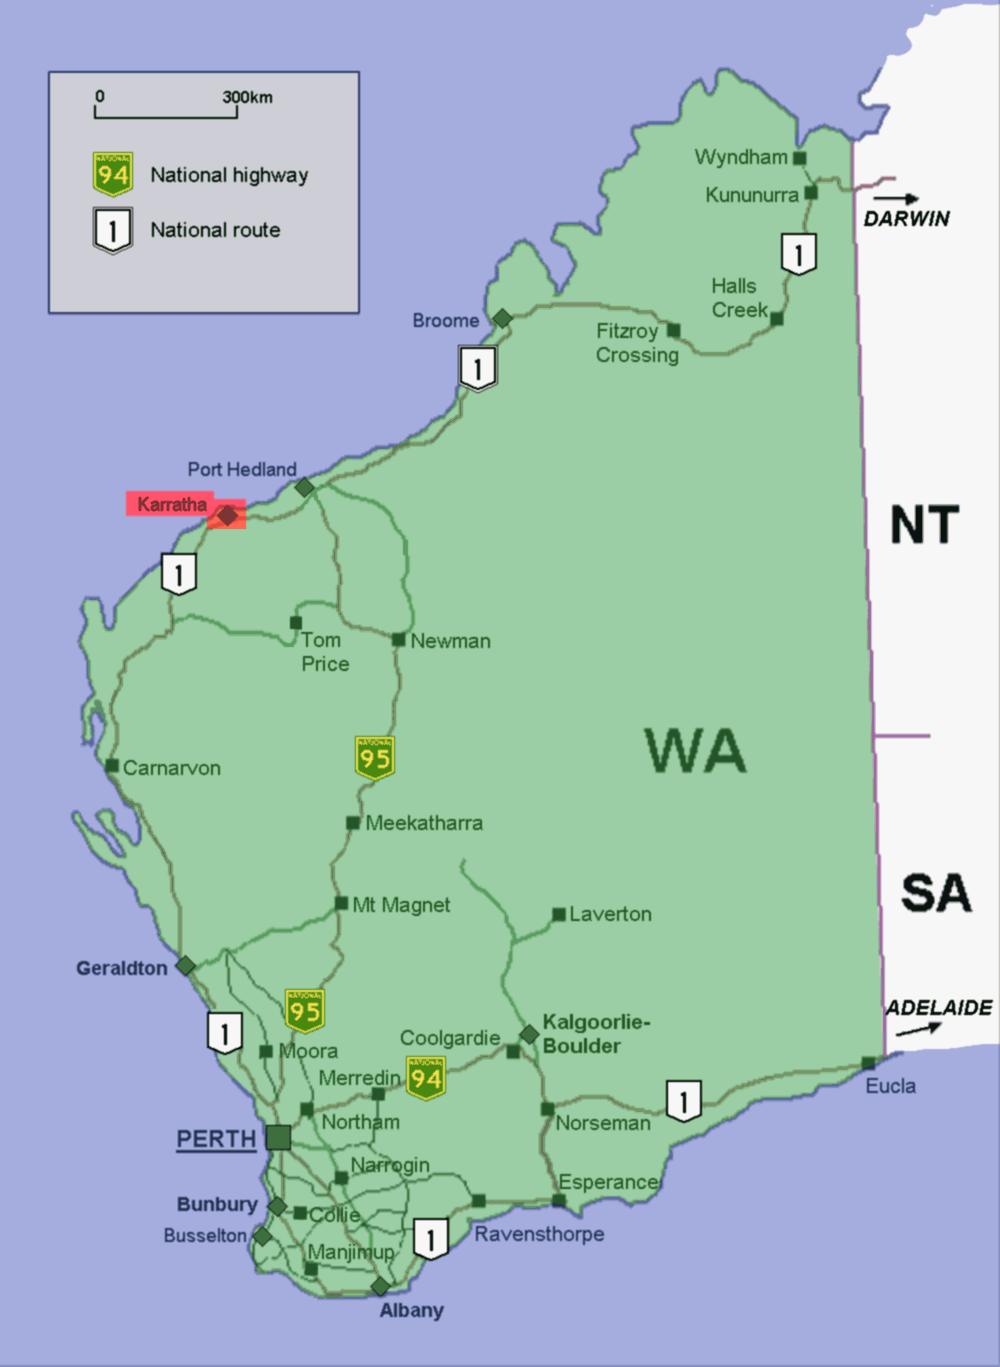 Australia Map Karratha.File Karratha Location Map In Western Australia Png Wikimedia Commons